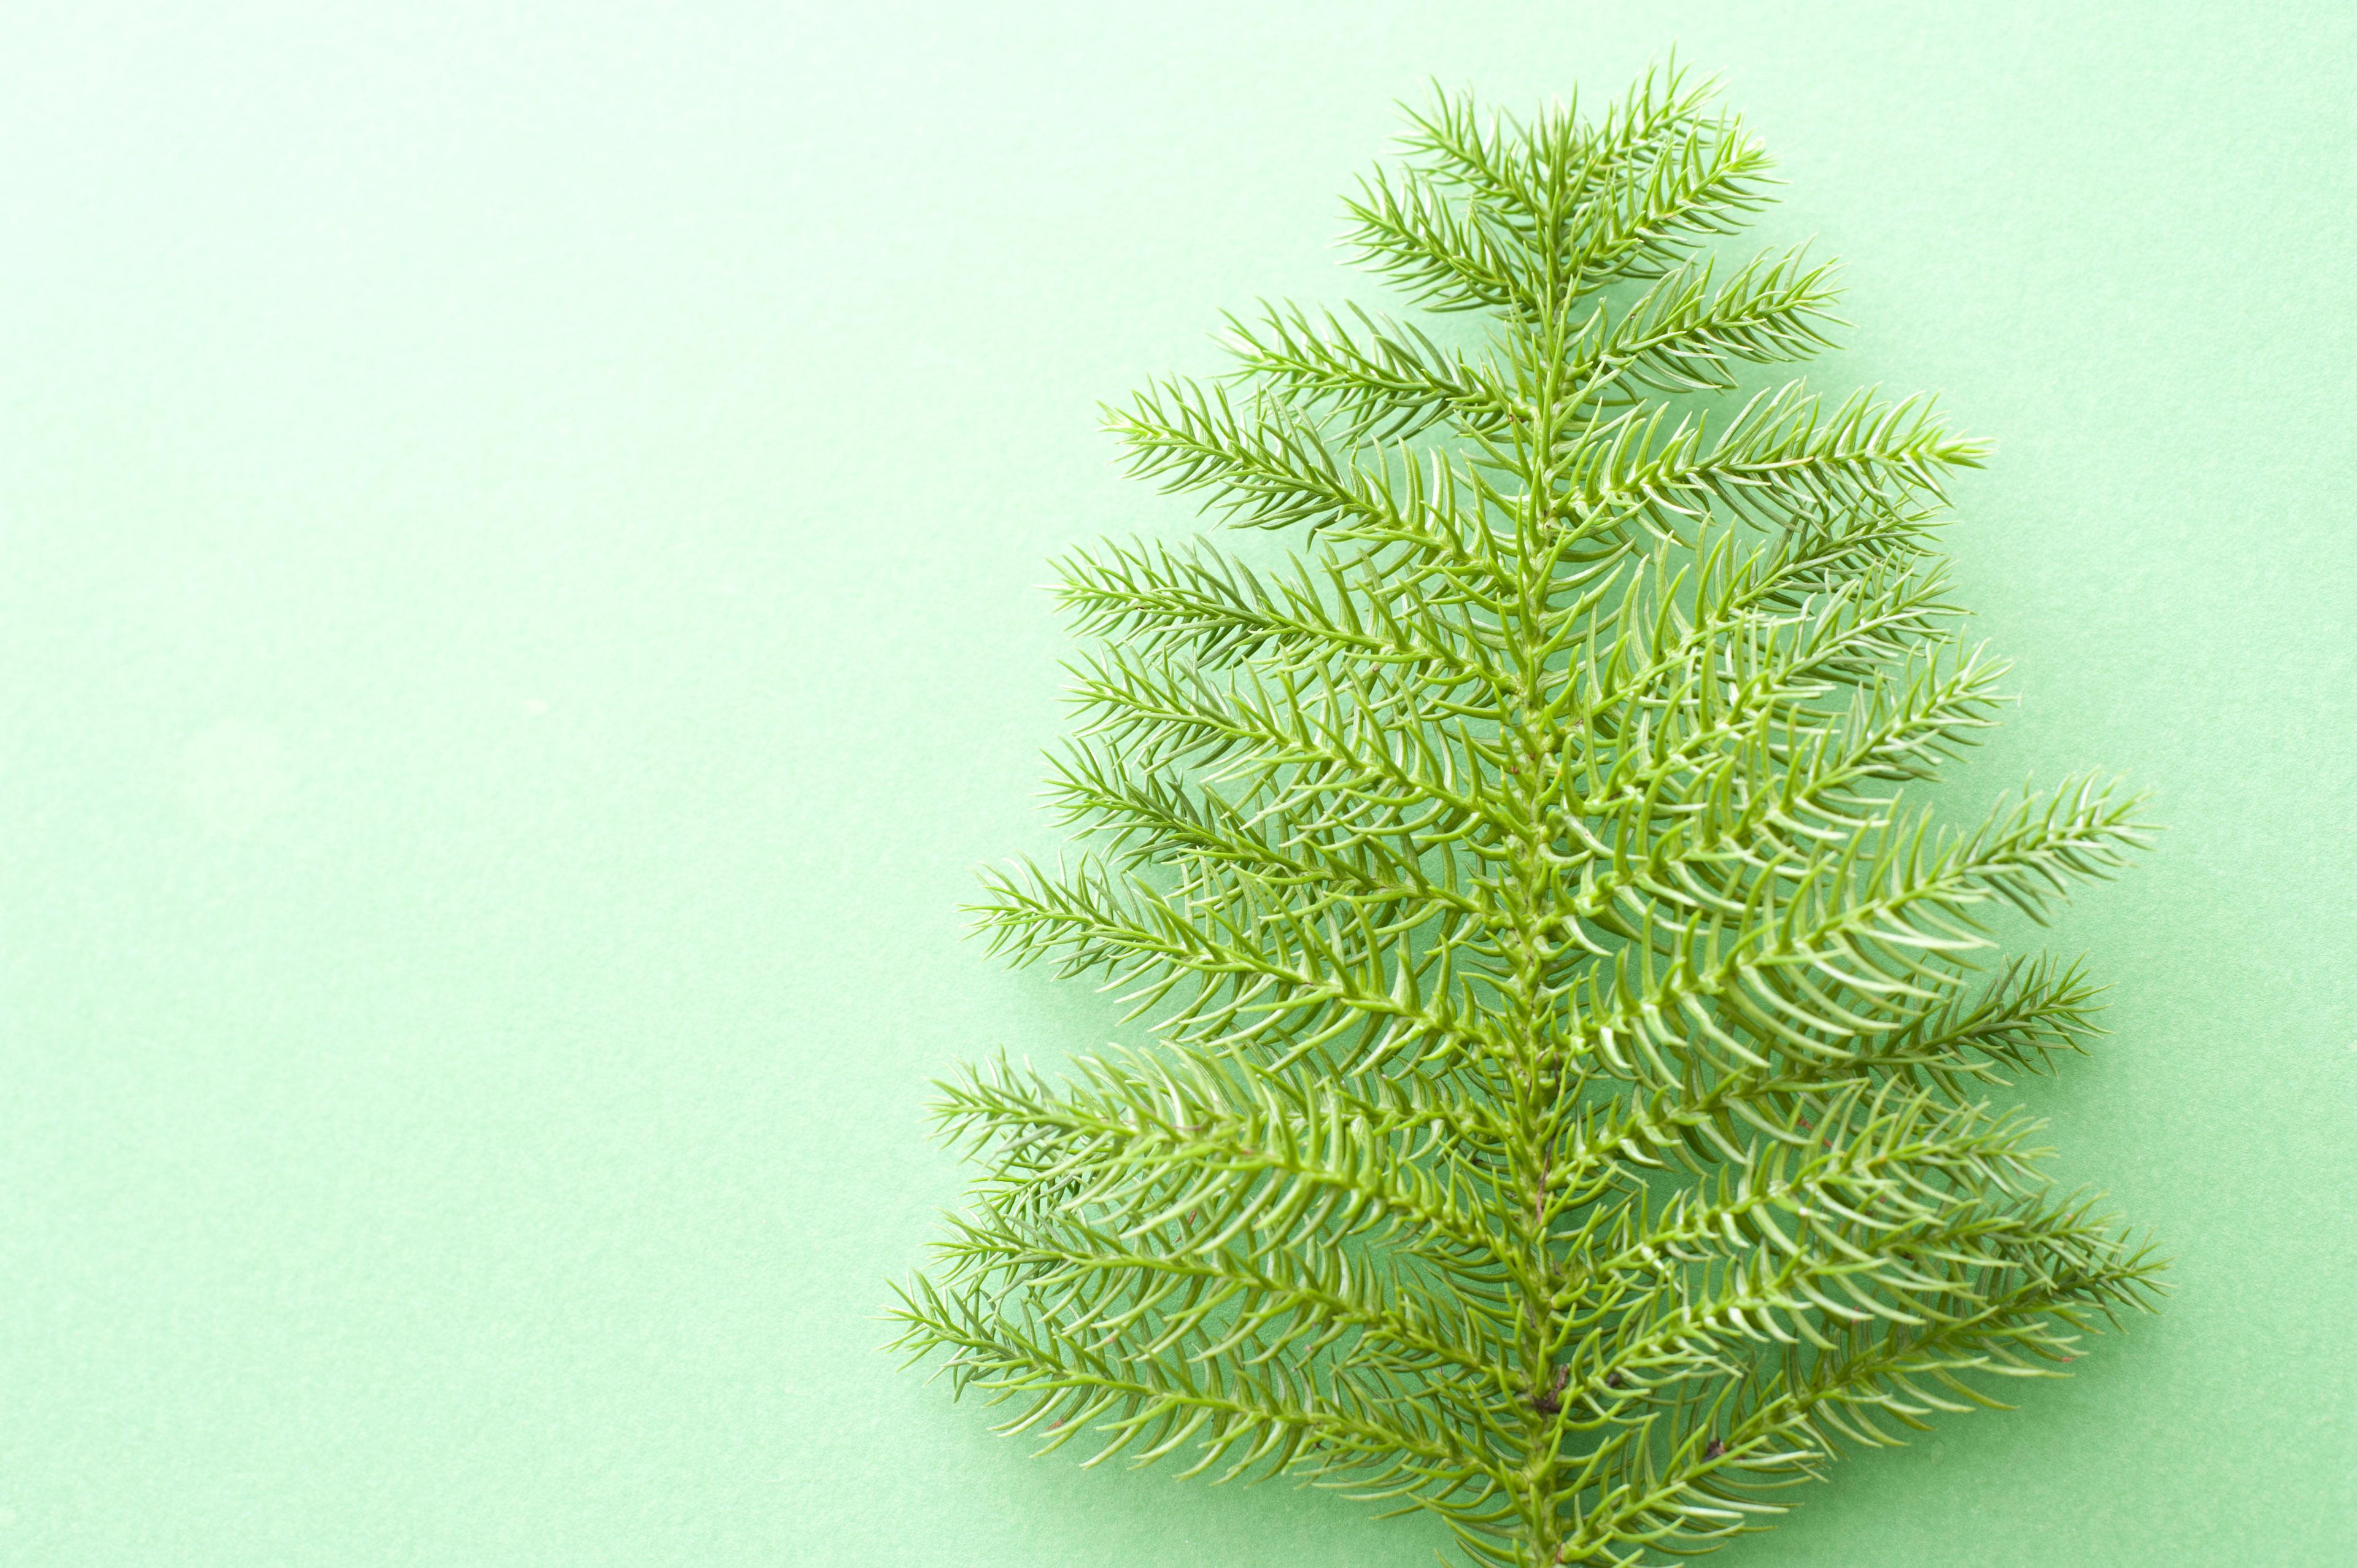 Image Of Christmas Fern Resembling A Tree Freebie Photography